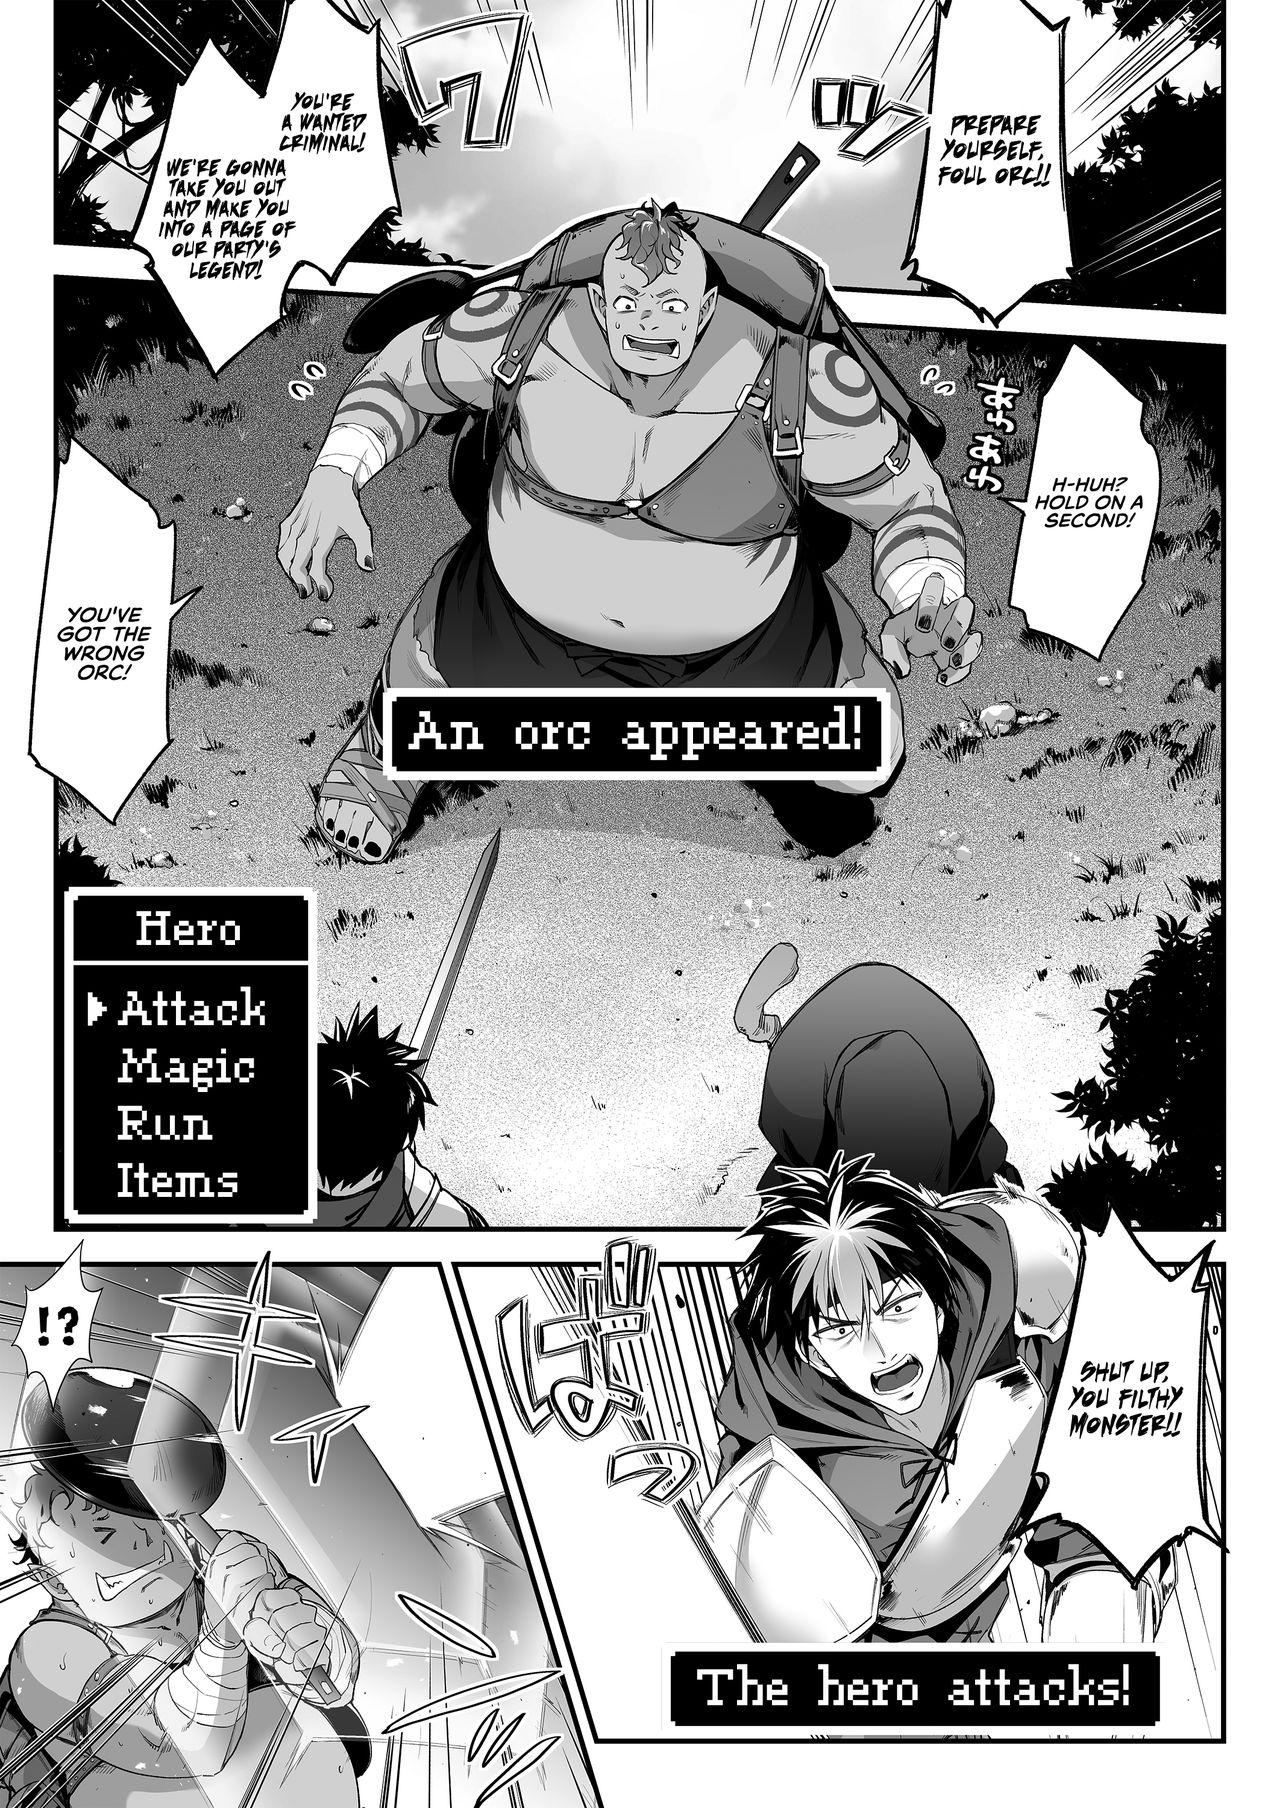 [Ichinose Land] Midara na Elf-san wa Orc-kun ga Osuki | The Lewd Elf likes the Orc [English] [RedLantern] [Digital] 3